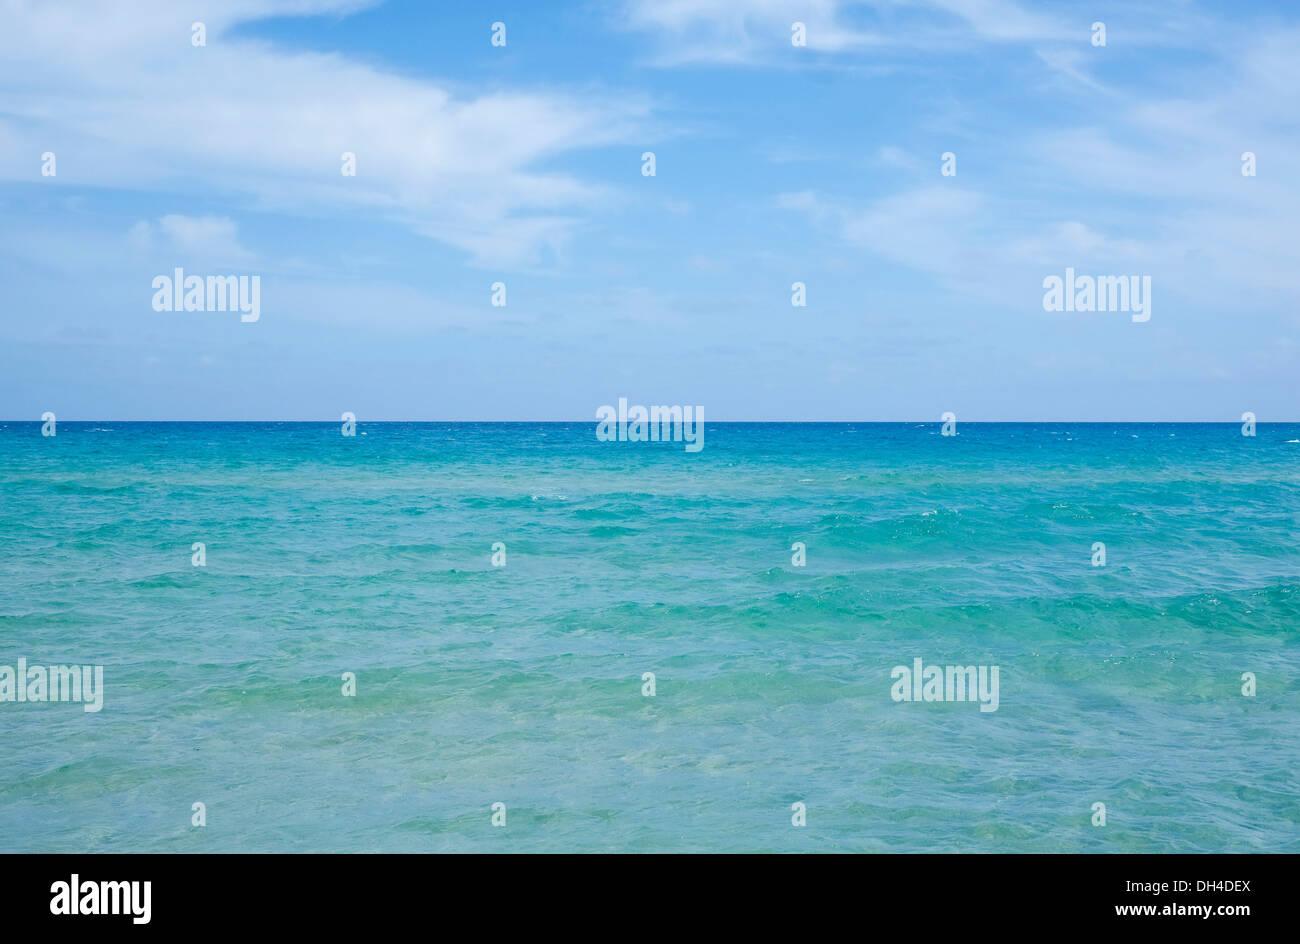 Sea and sky with sea horizon in Chia, Sardinia, Italy - Stock Image